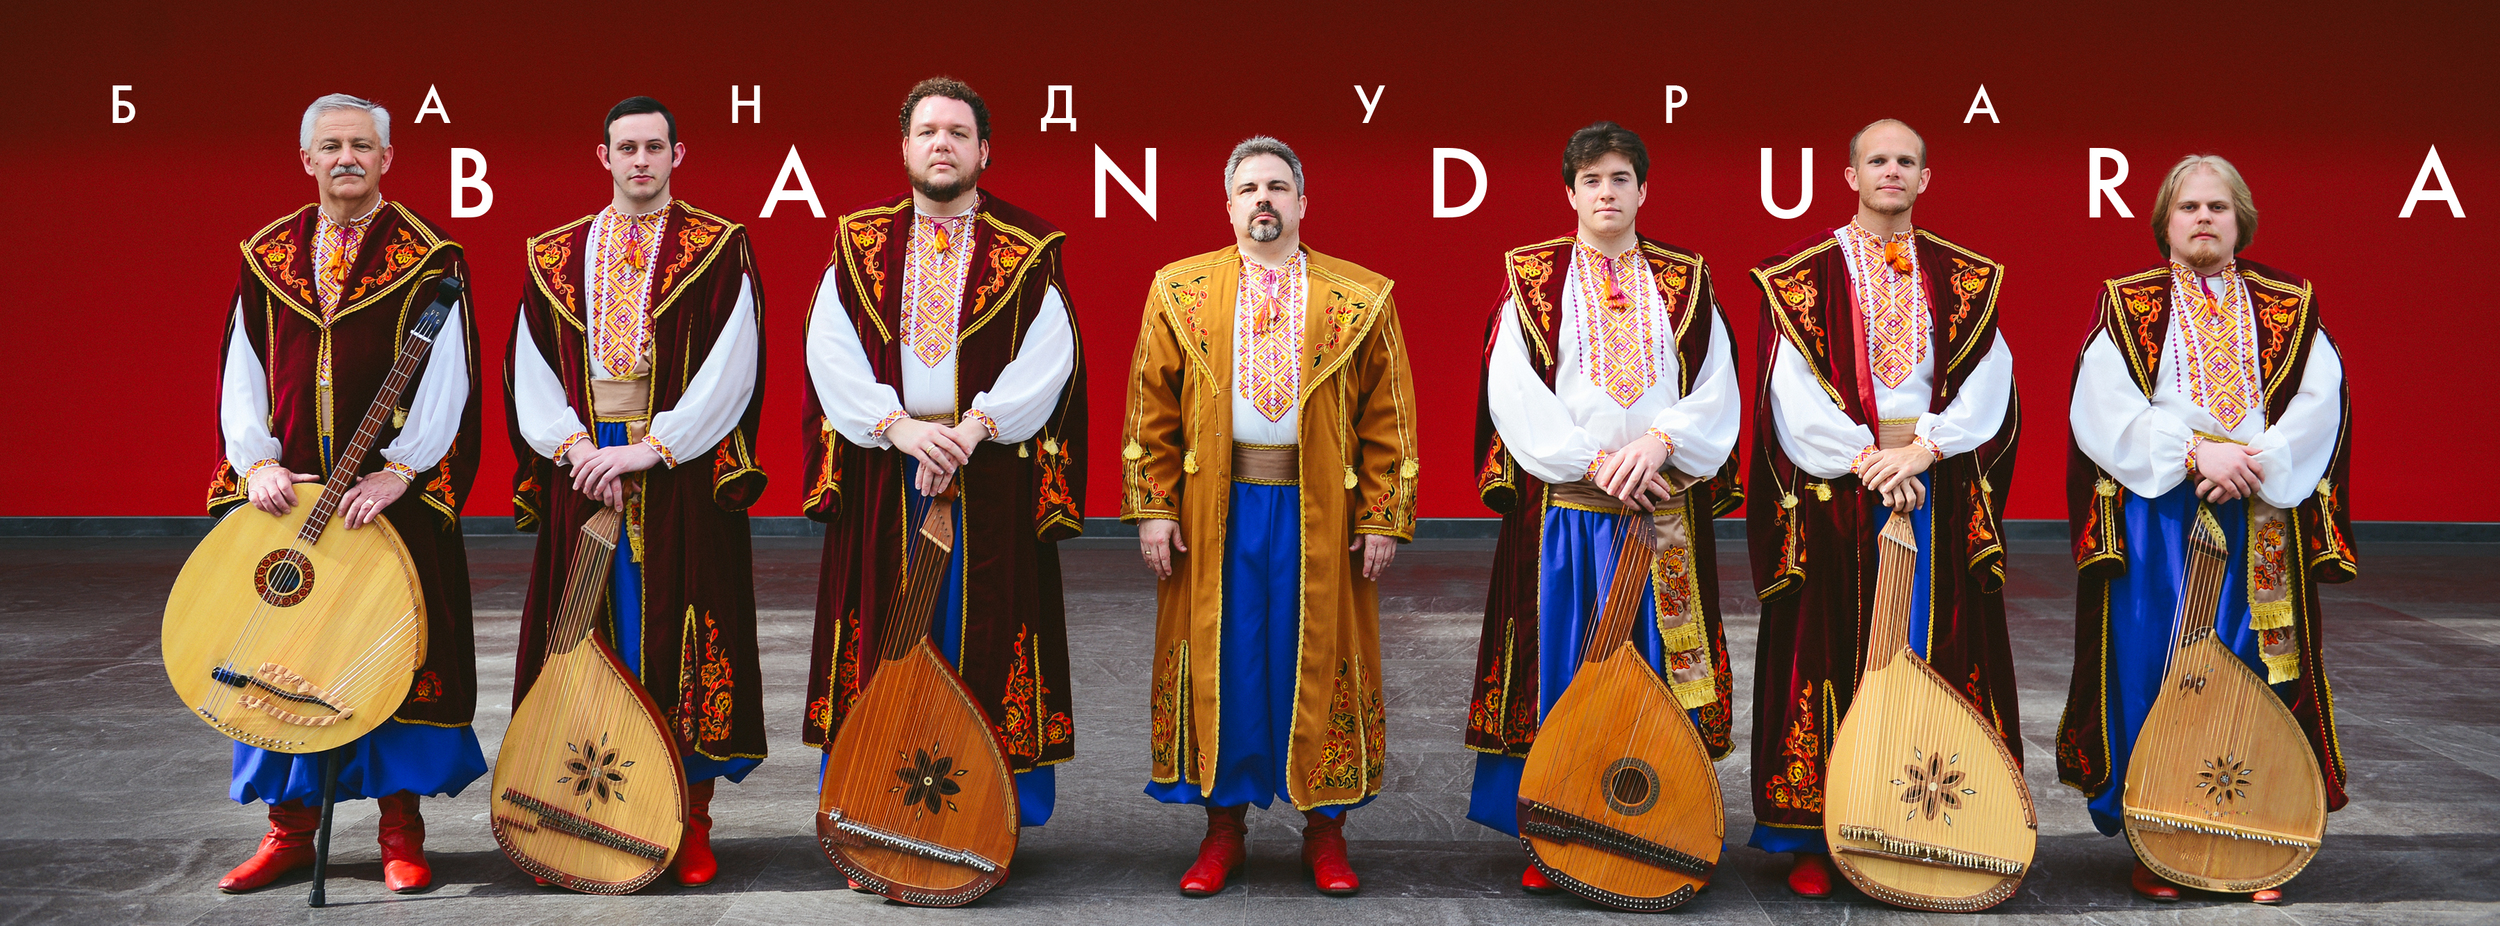 Ukrainian Bandurist Chorus Promotion